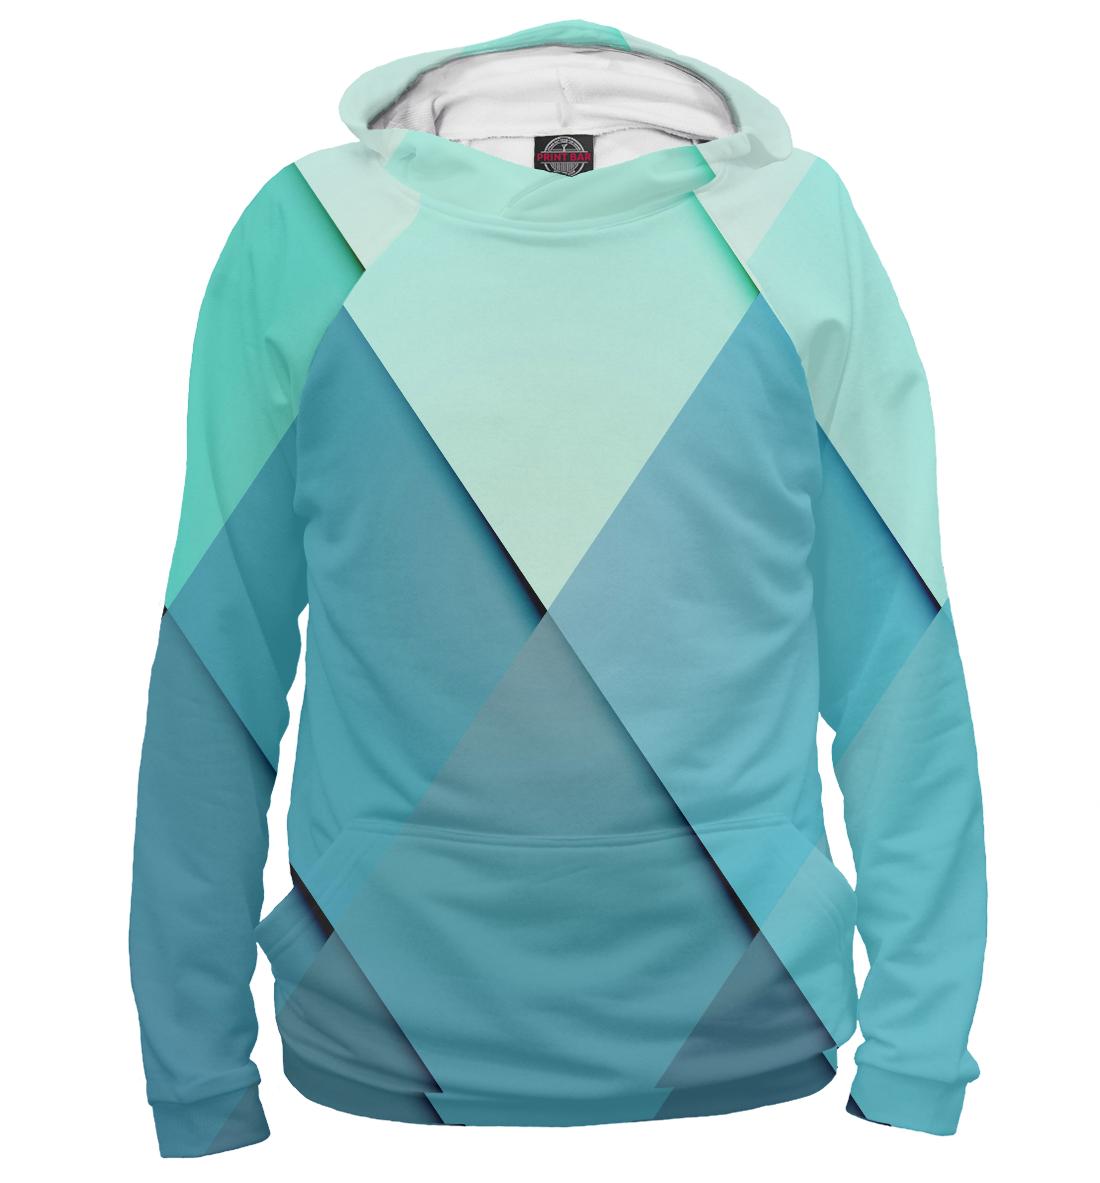 Azure rhombuses